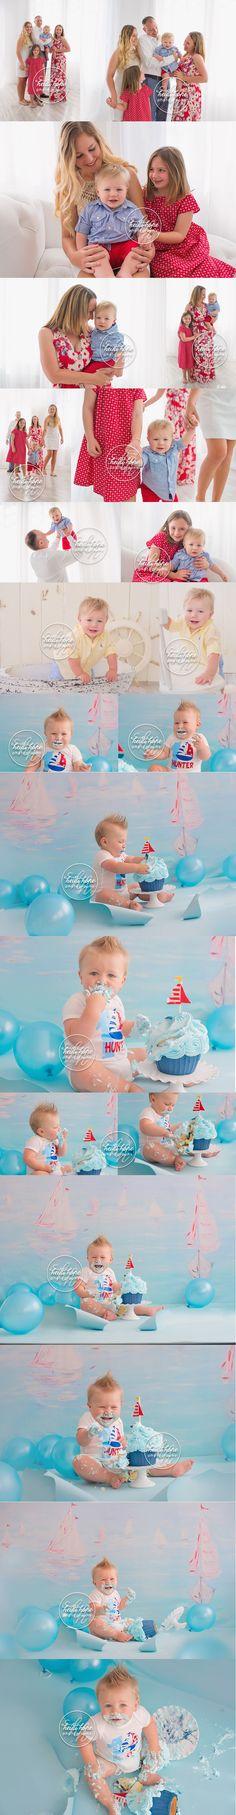 classic boy nautical cakesmash session by rhode island baby photographer heidi hope